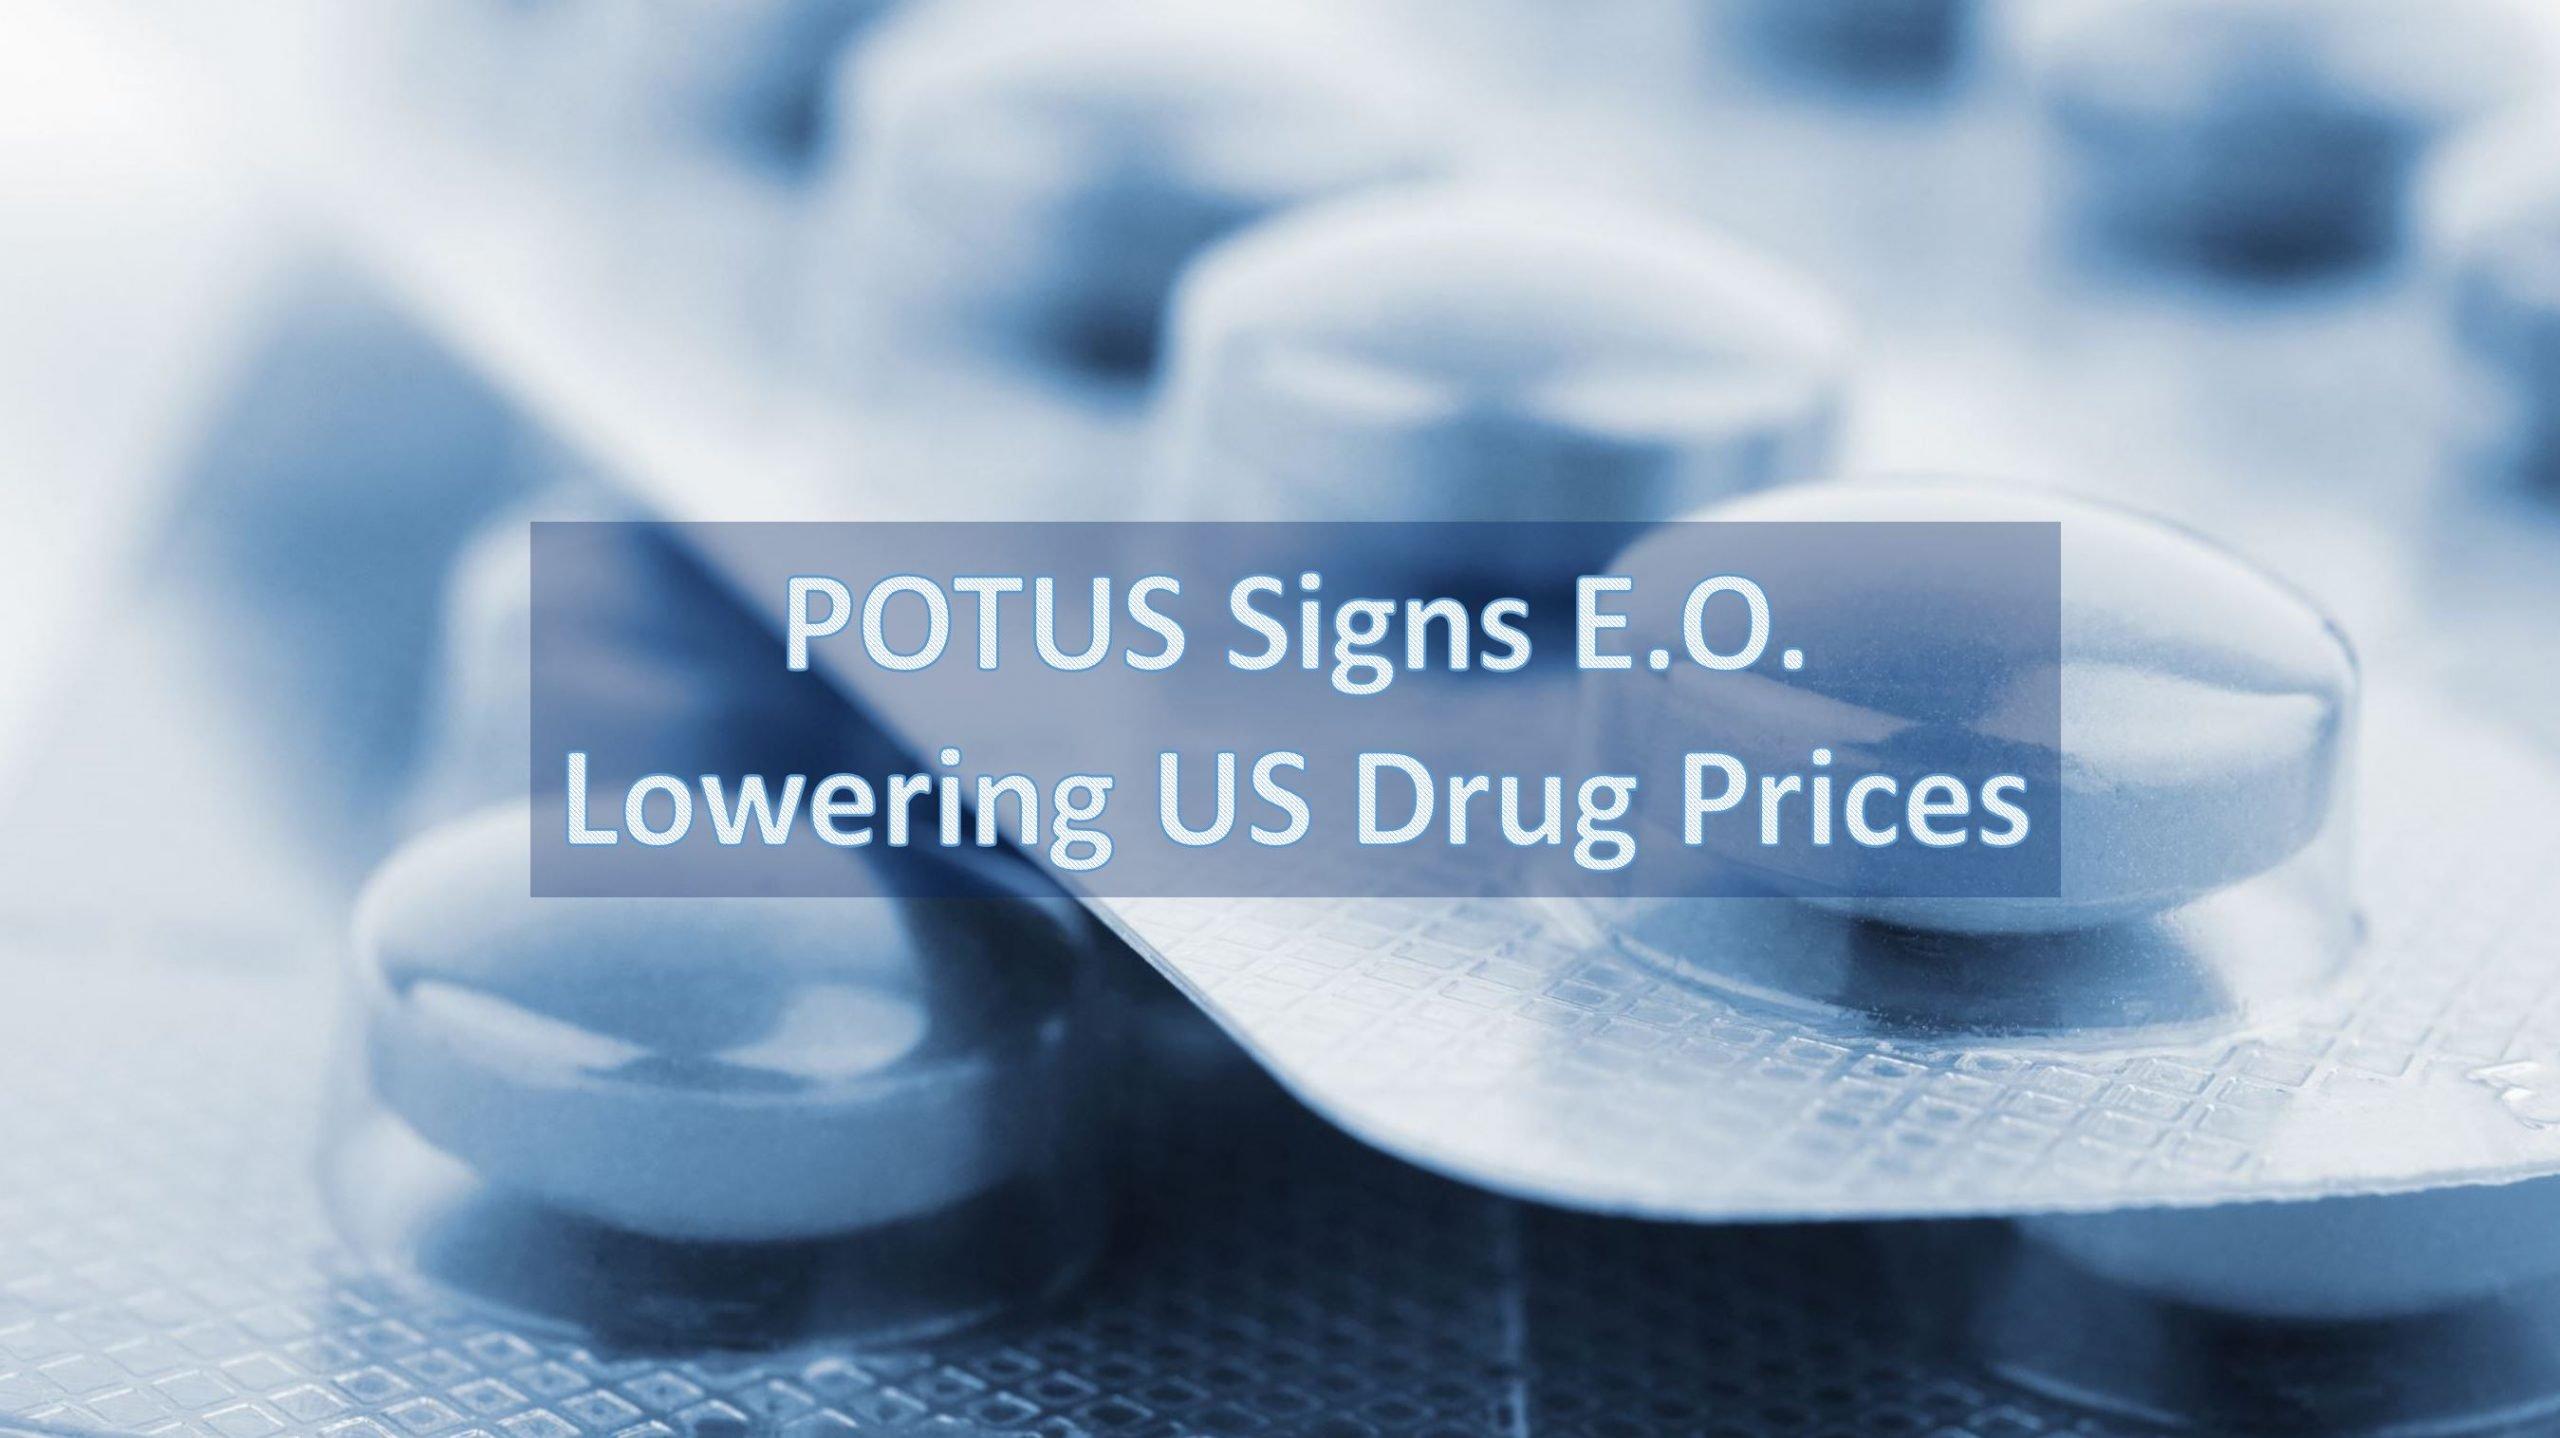 Lower Prescription Drug Prices | POTUS EO - July 2020 | Insulin/EpiPen | Most Favored Nation (MFN) | Prescriptions